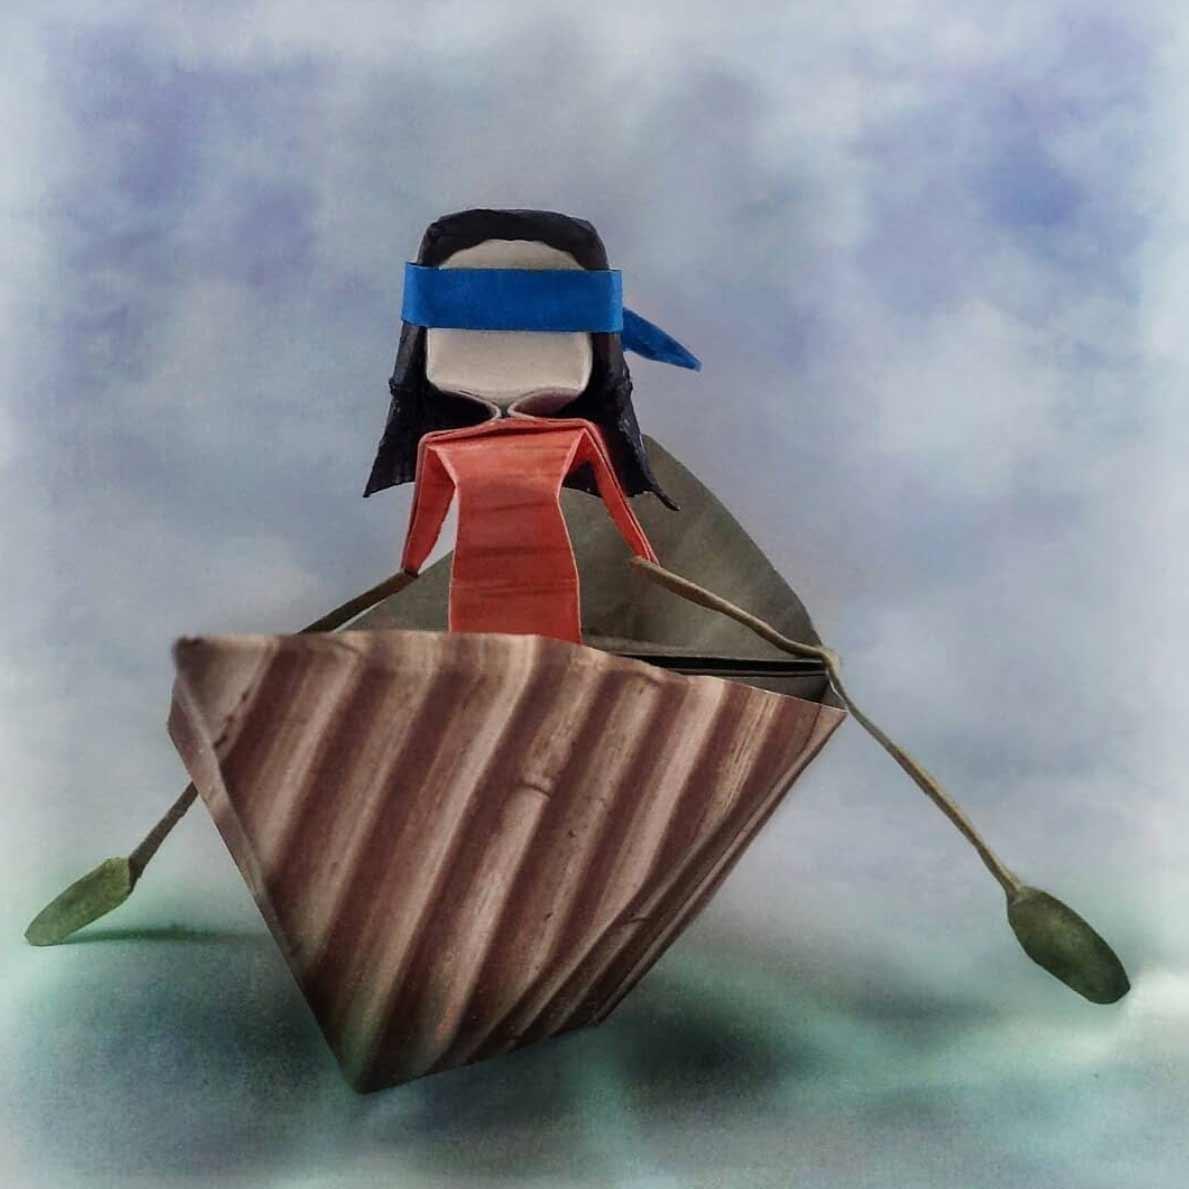 Popkultur-Origami-Figuren von Louise Cassidy origami-figuren-Louise-Cassidy_14